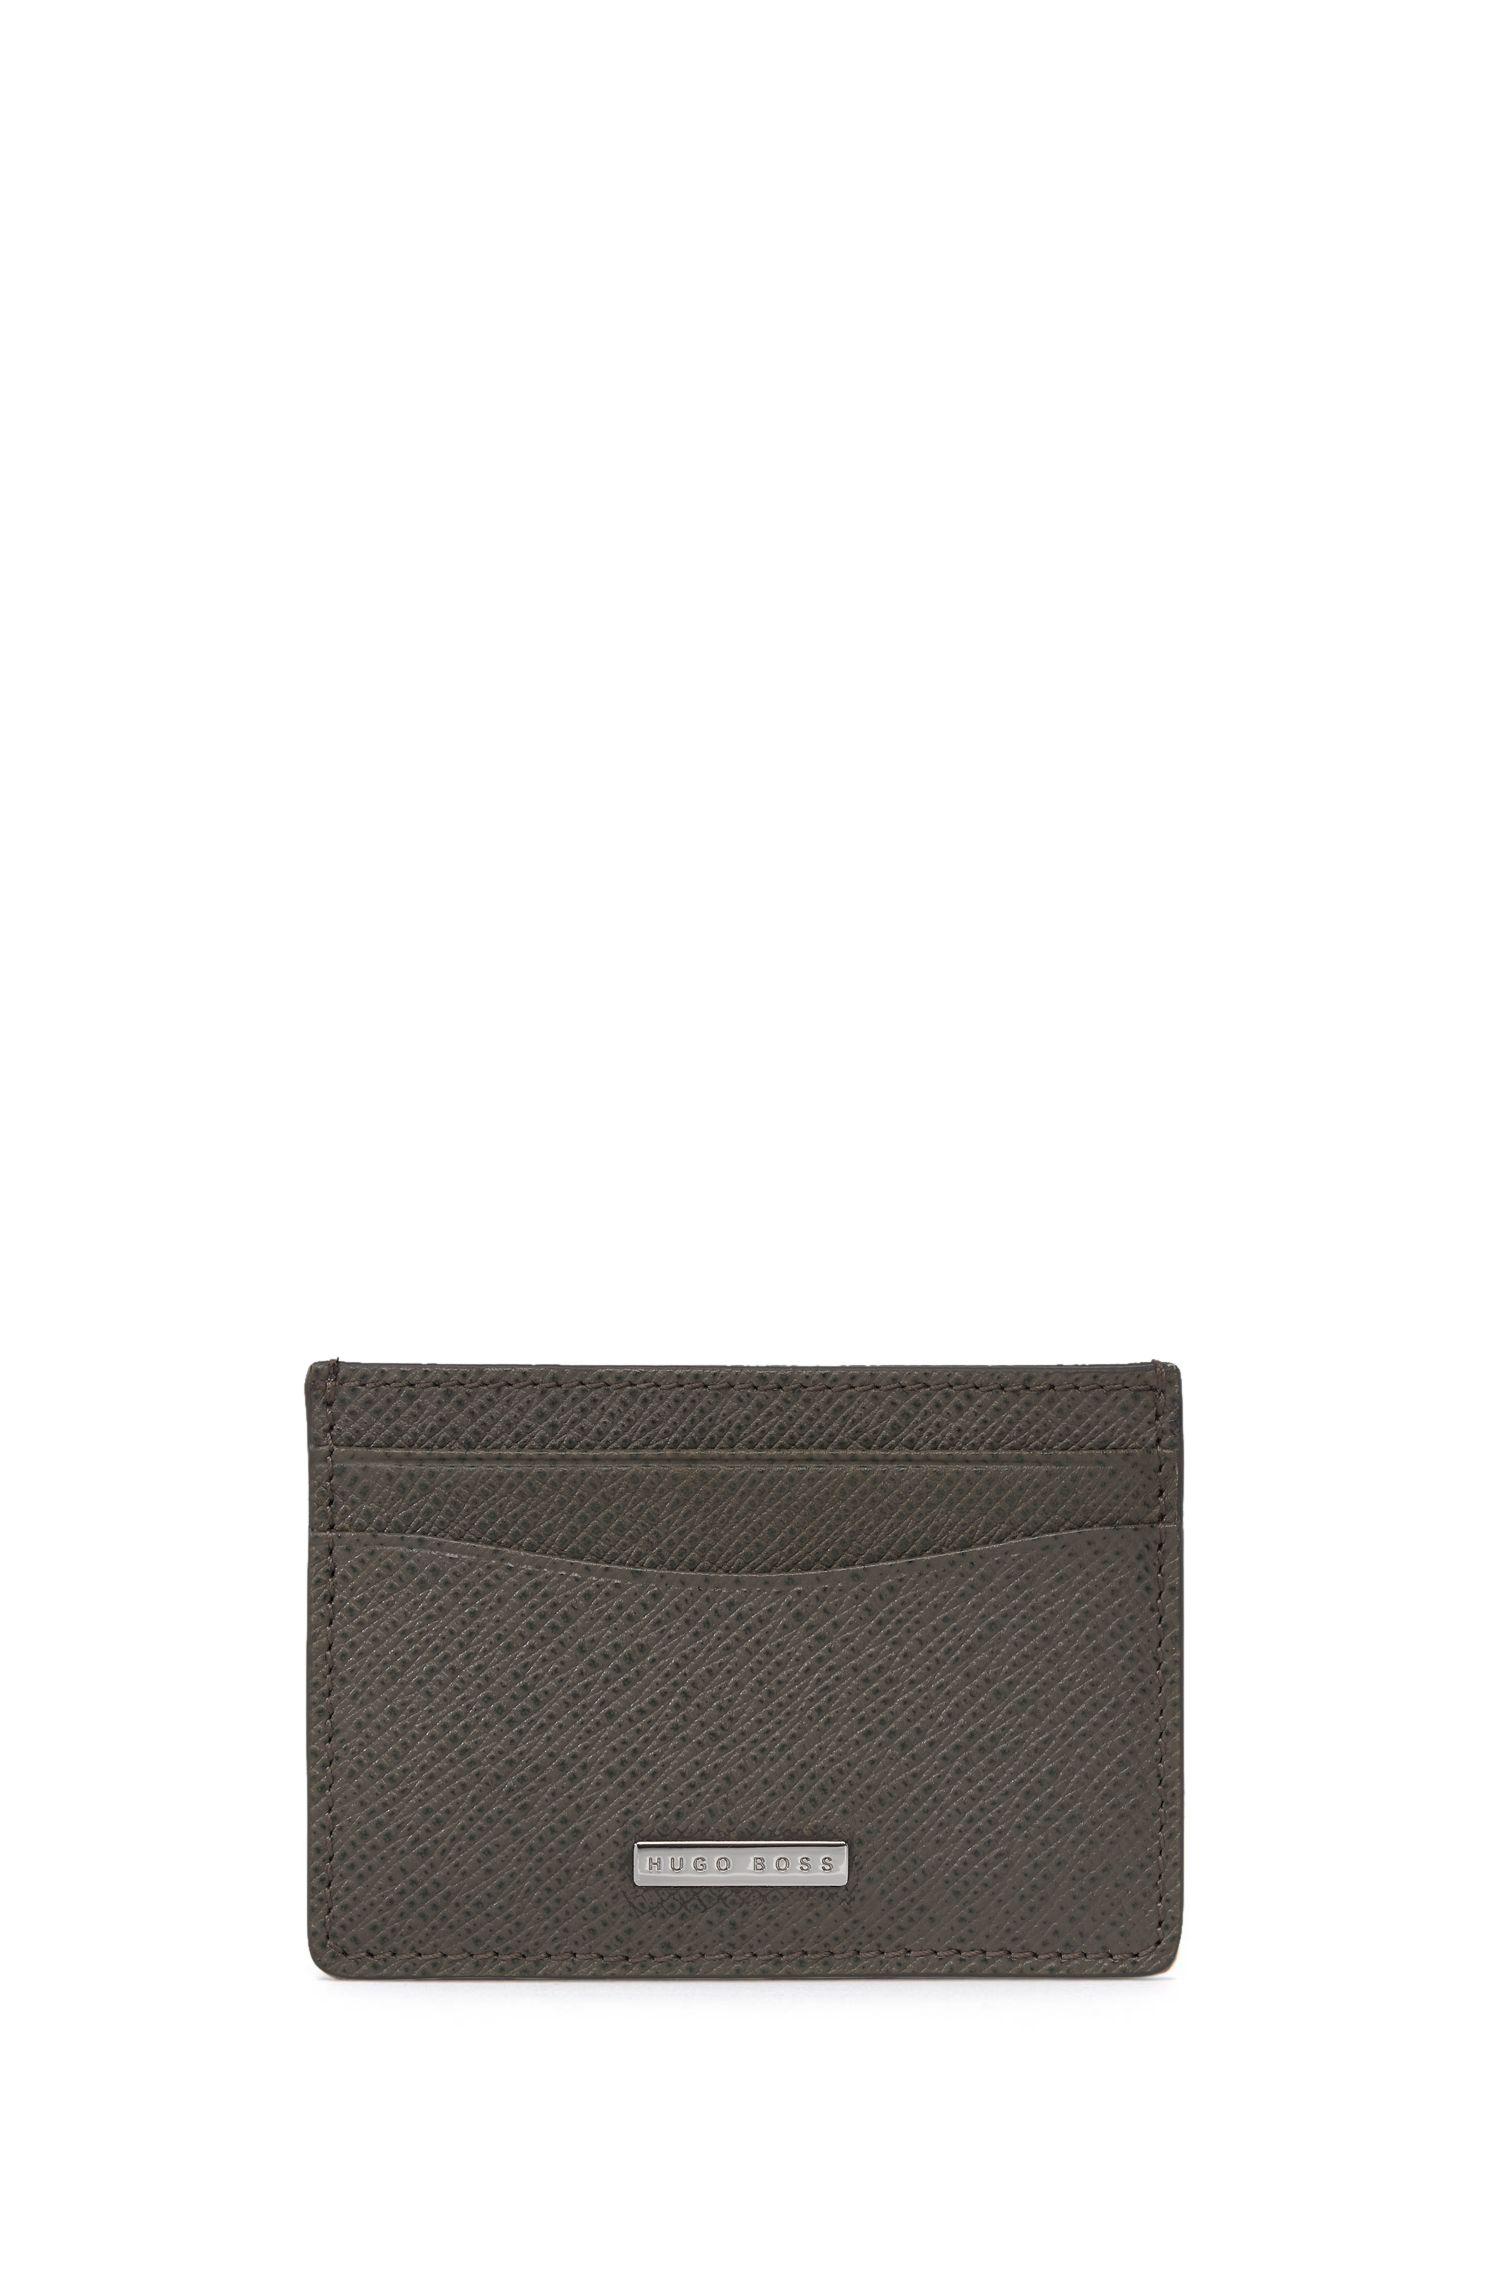 Calfskin Card Case | Signature S Card